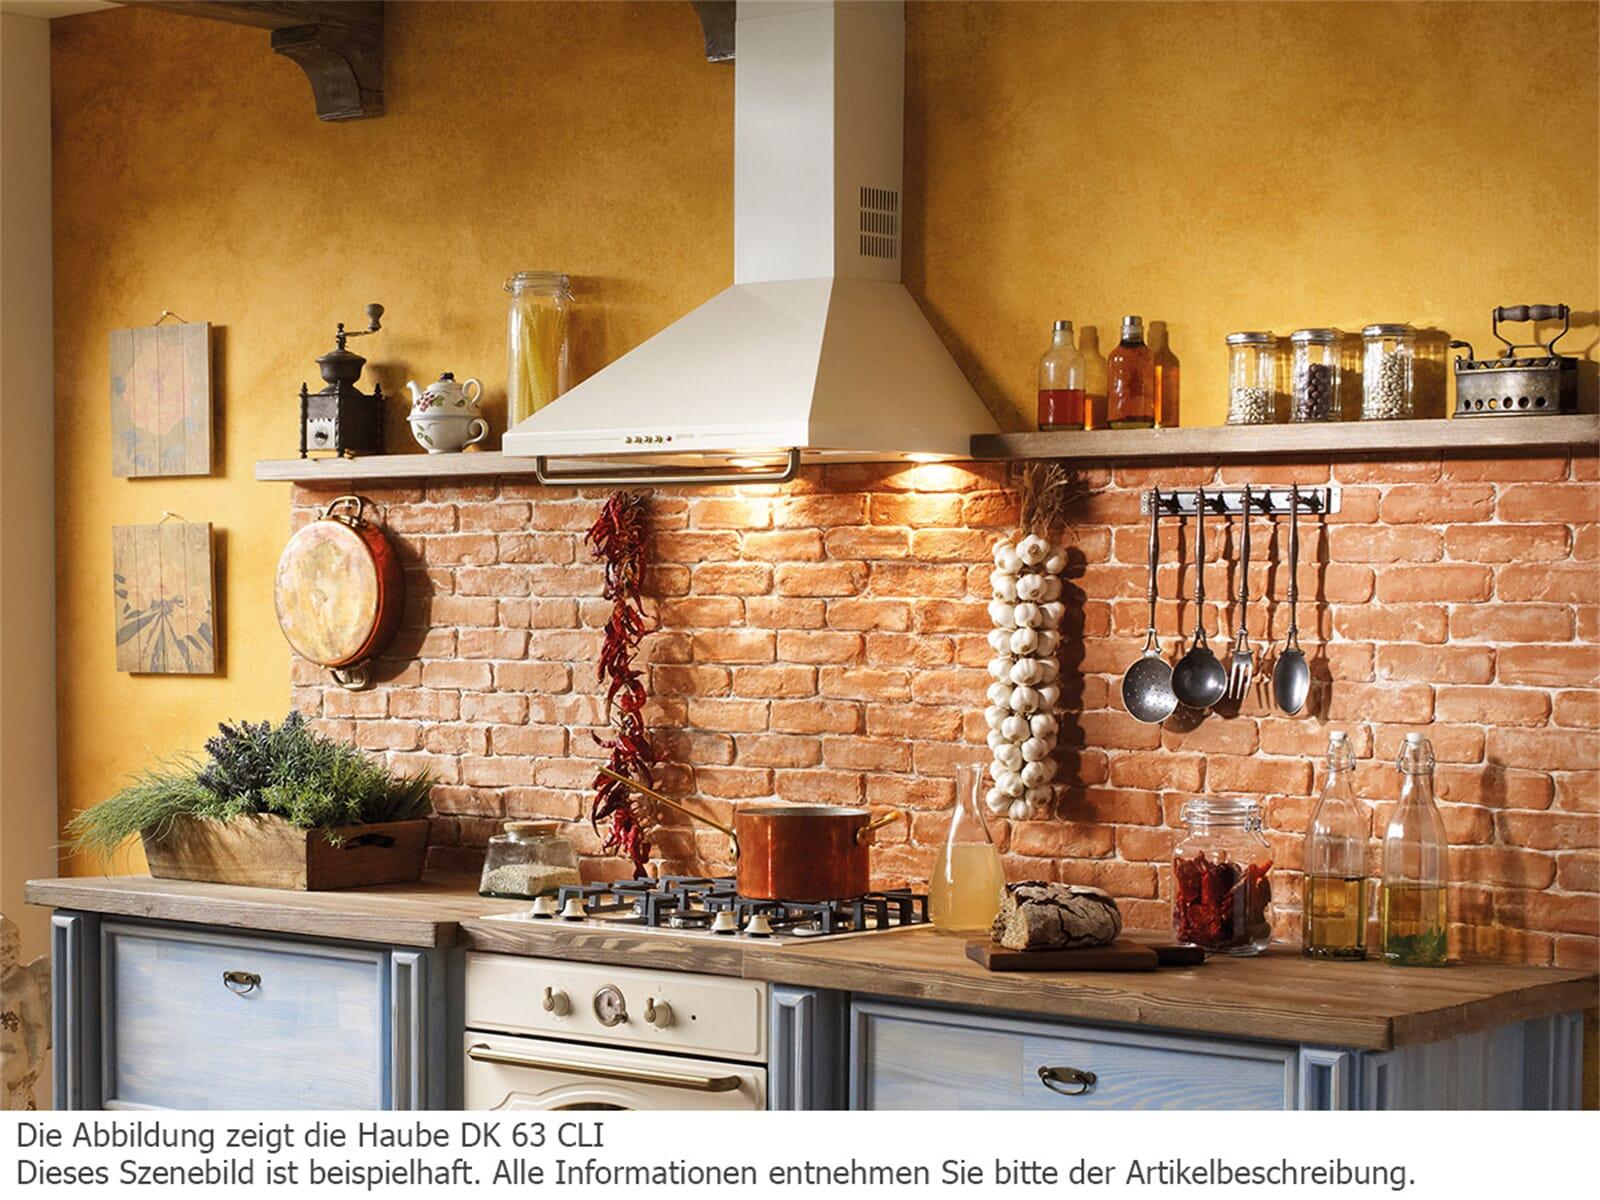 gorenje dk 63 cli classico wand dunstabzugshaube elfenbein beige abzugshaube ebay. Black Bedroom Furniture Sets. Home Design Ideas